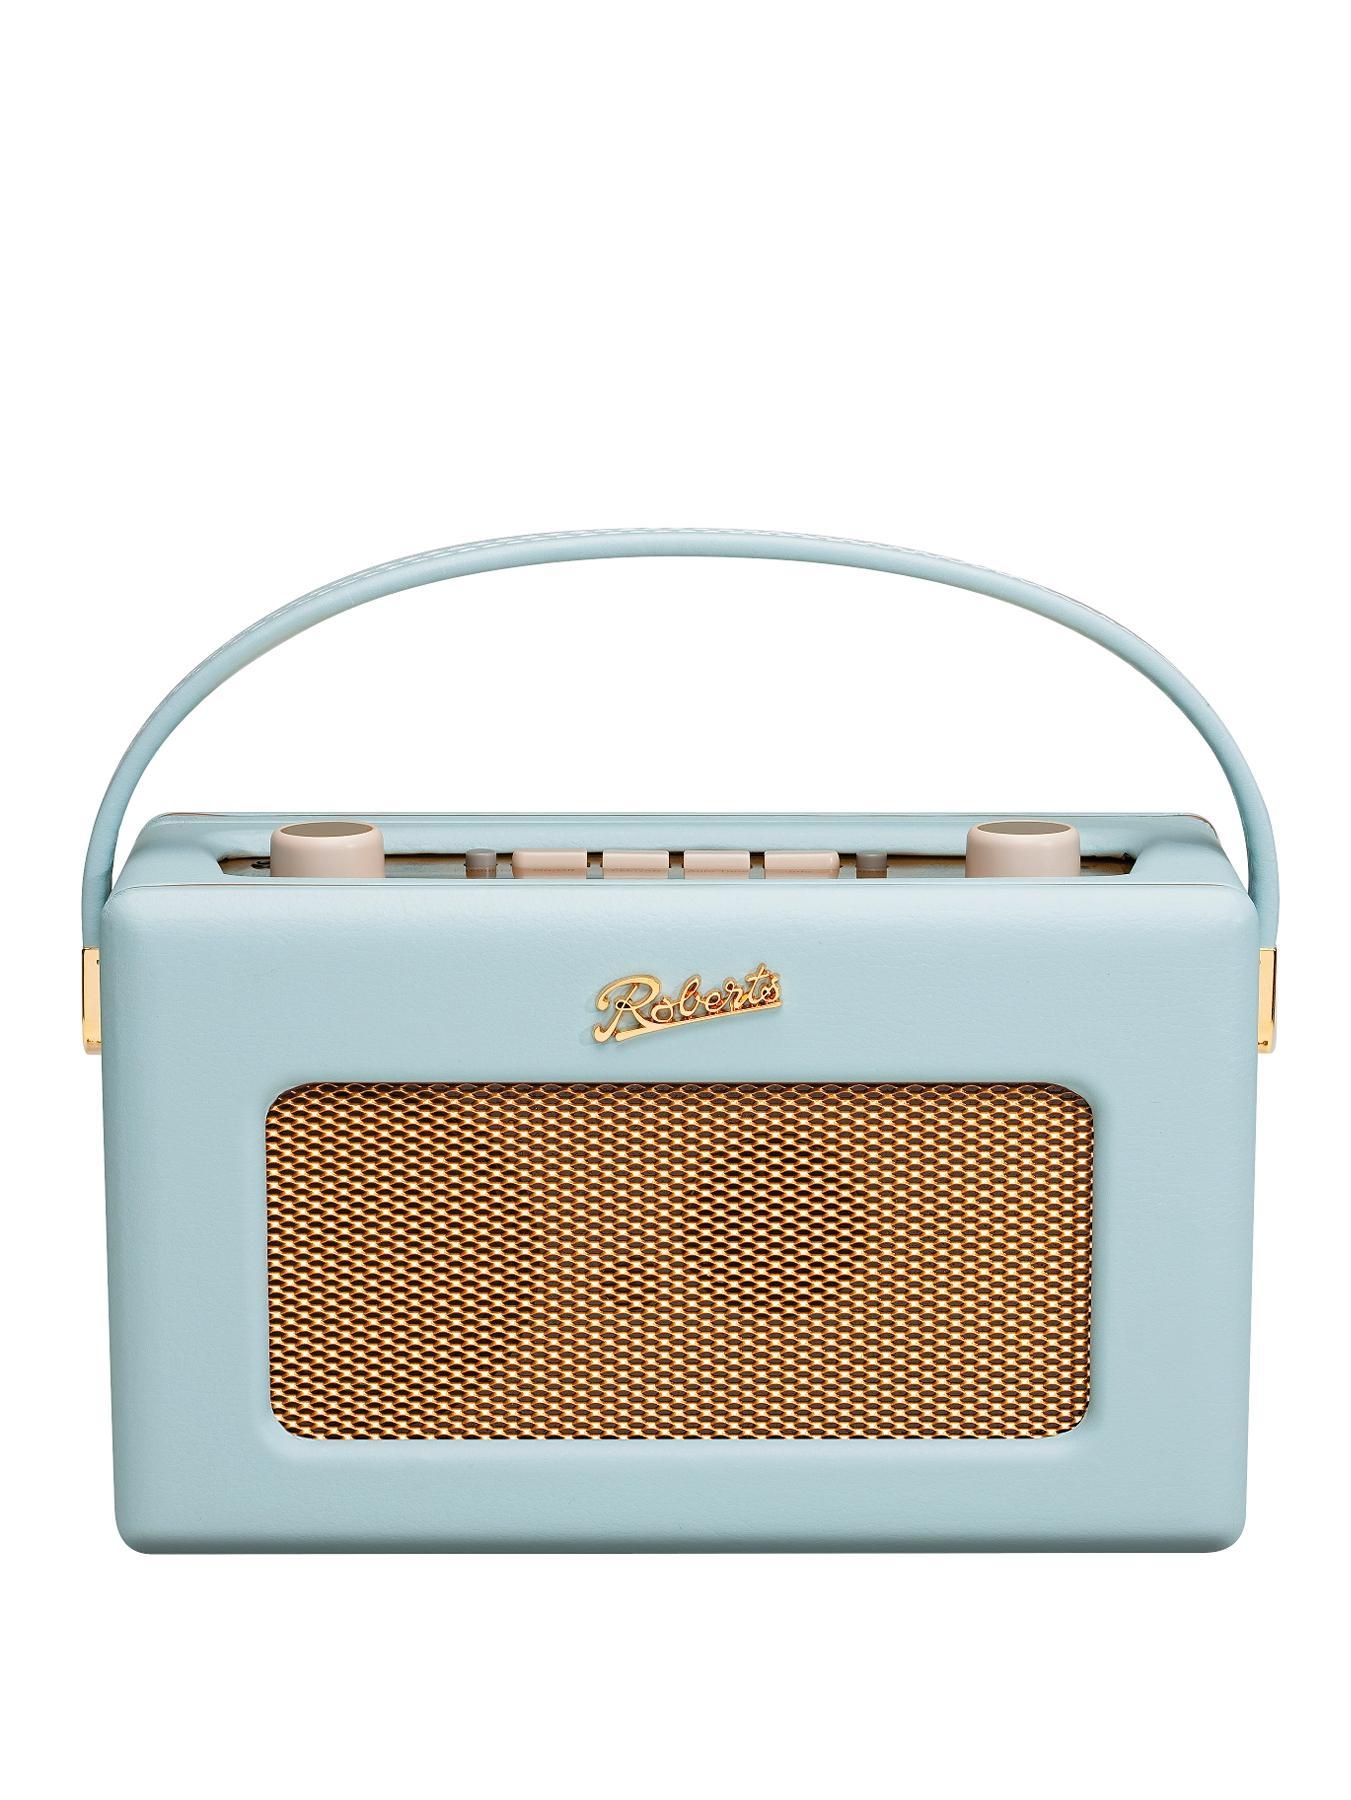 Roberts Revival DAB/FM RDS Digital Radio - Duck-Egg Blue